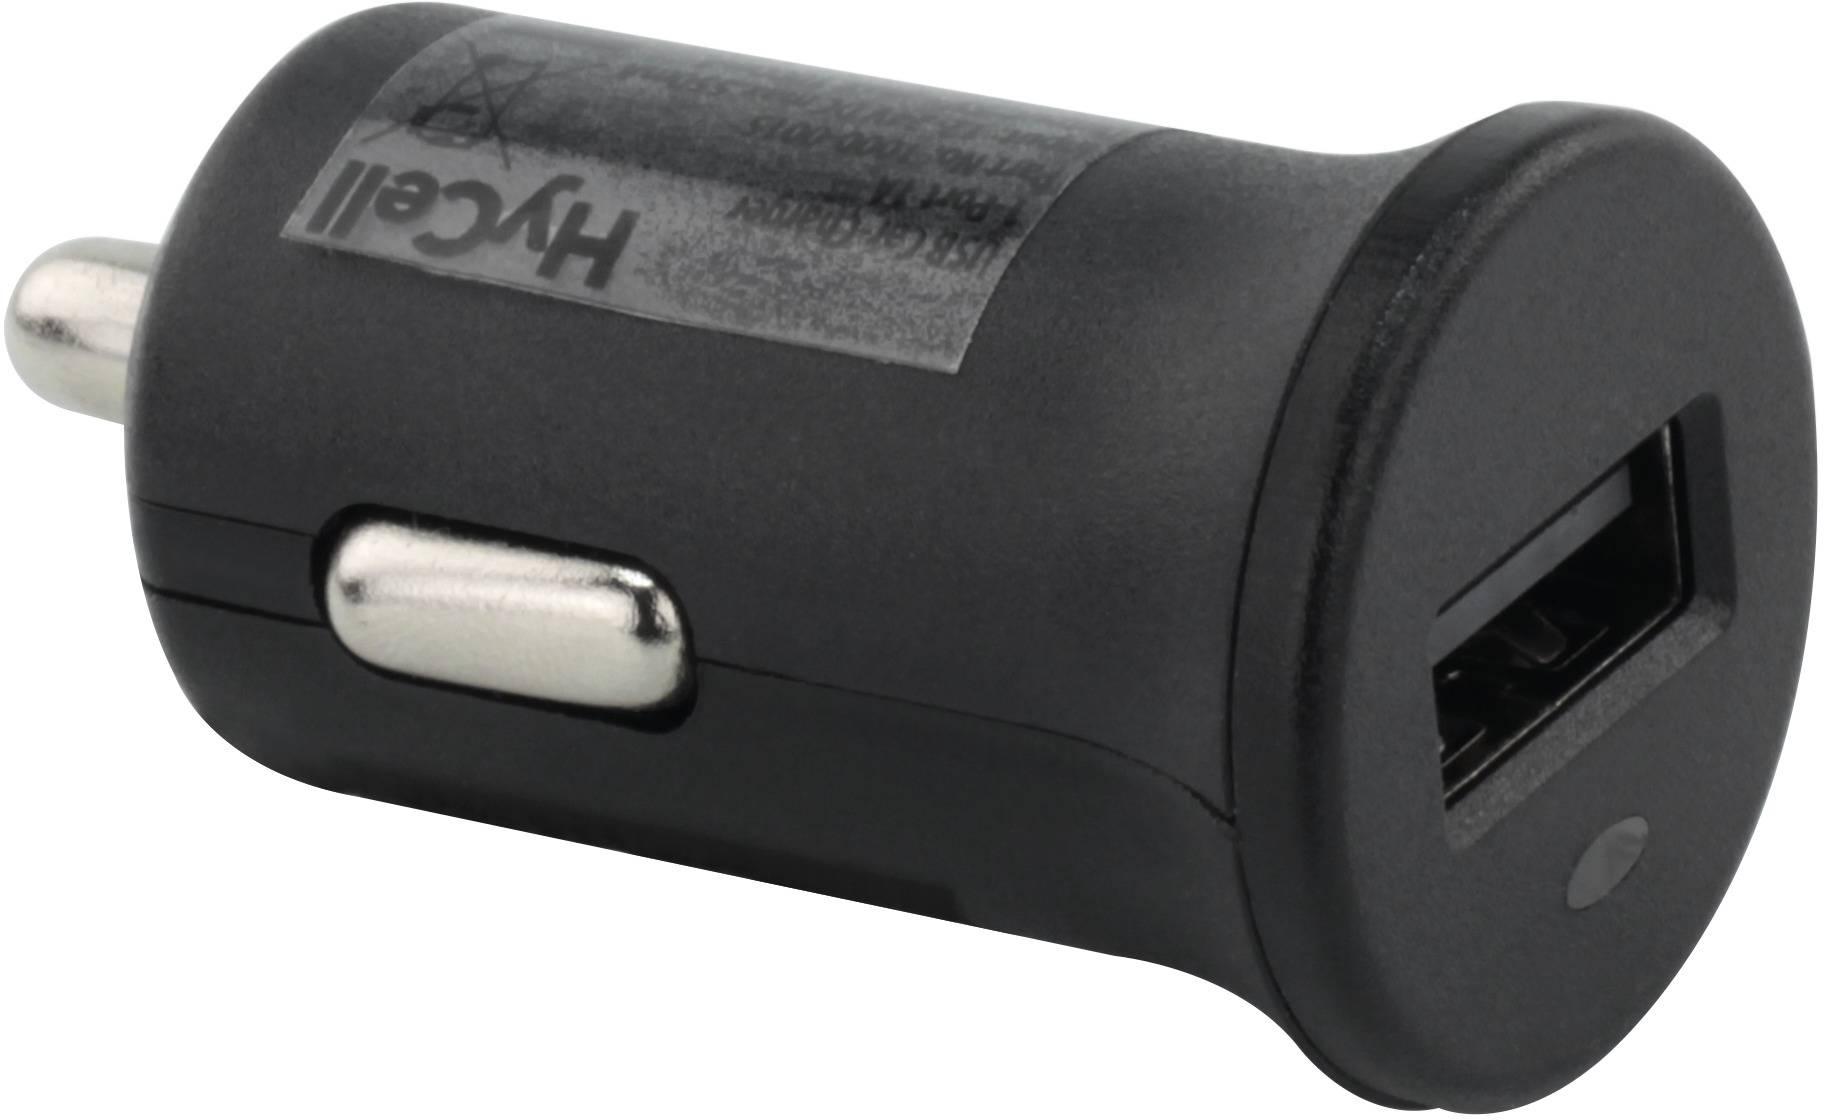 VOLTCRAFT CPAS 1000 CPAS 1000 USB Ladegerät KFZ, LKW